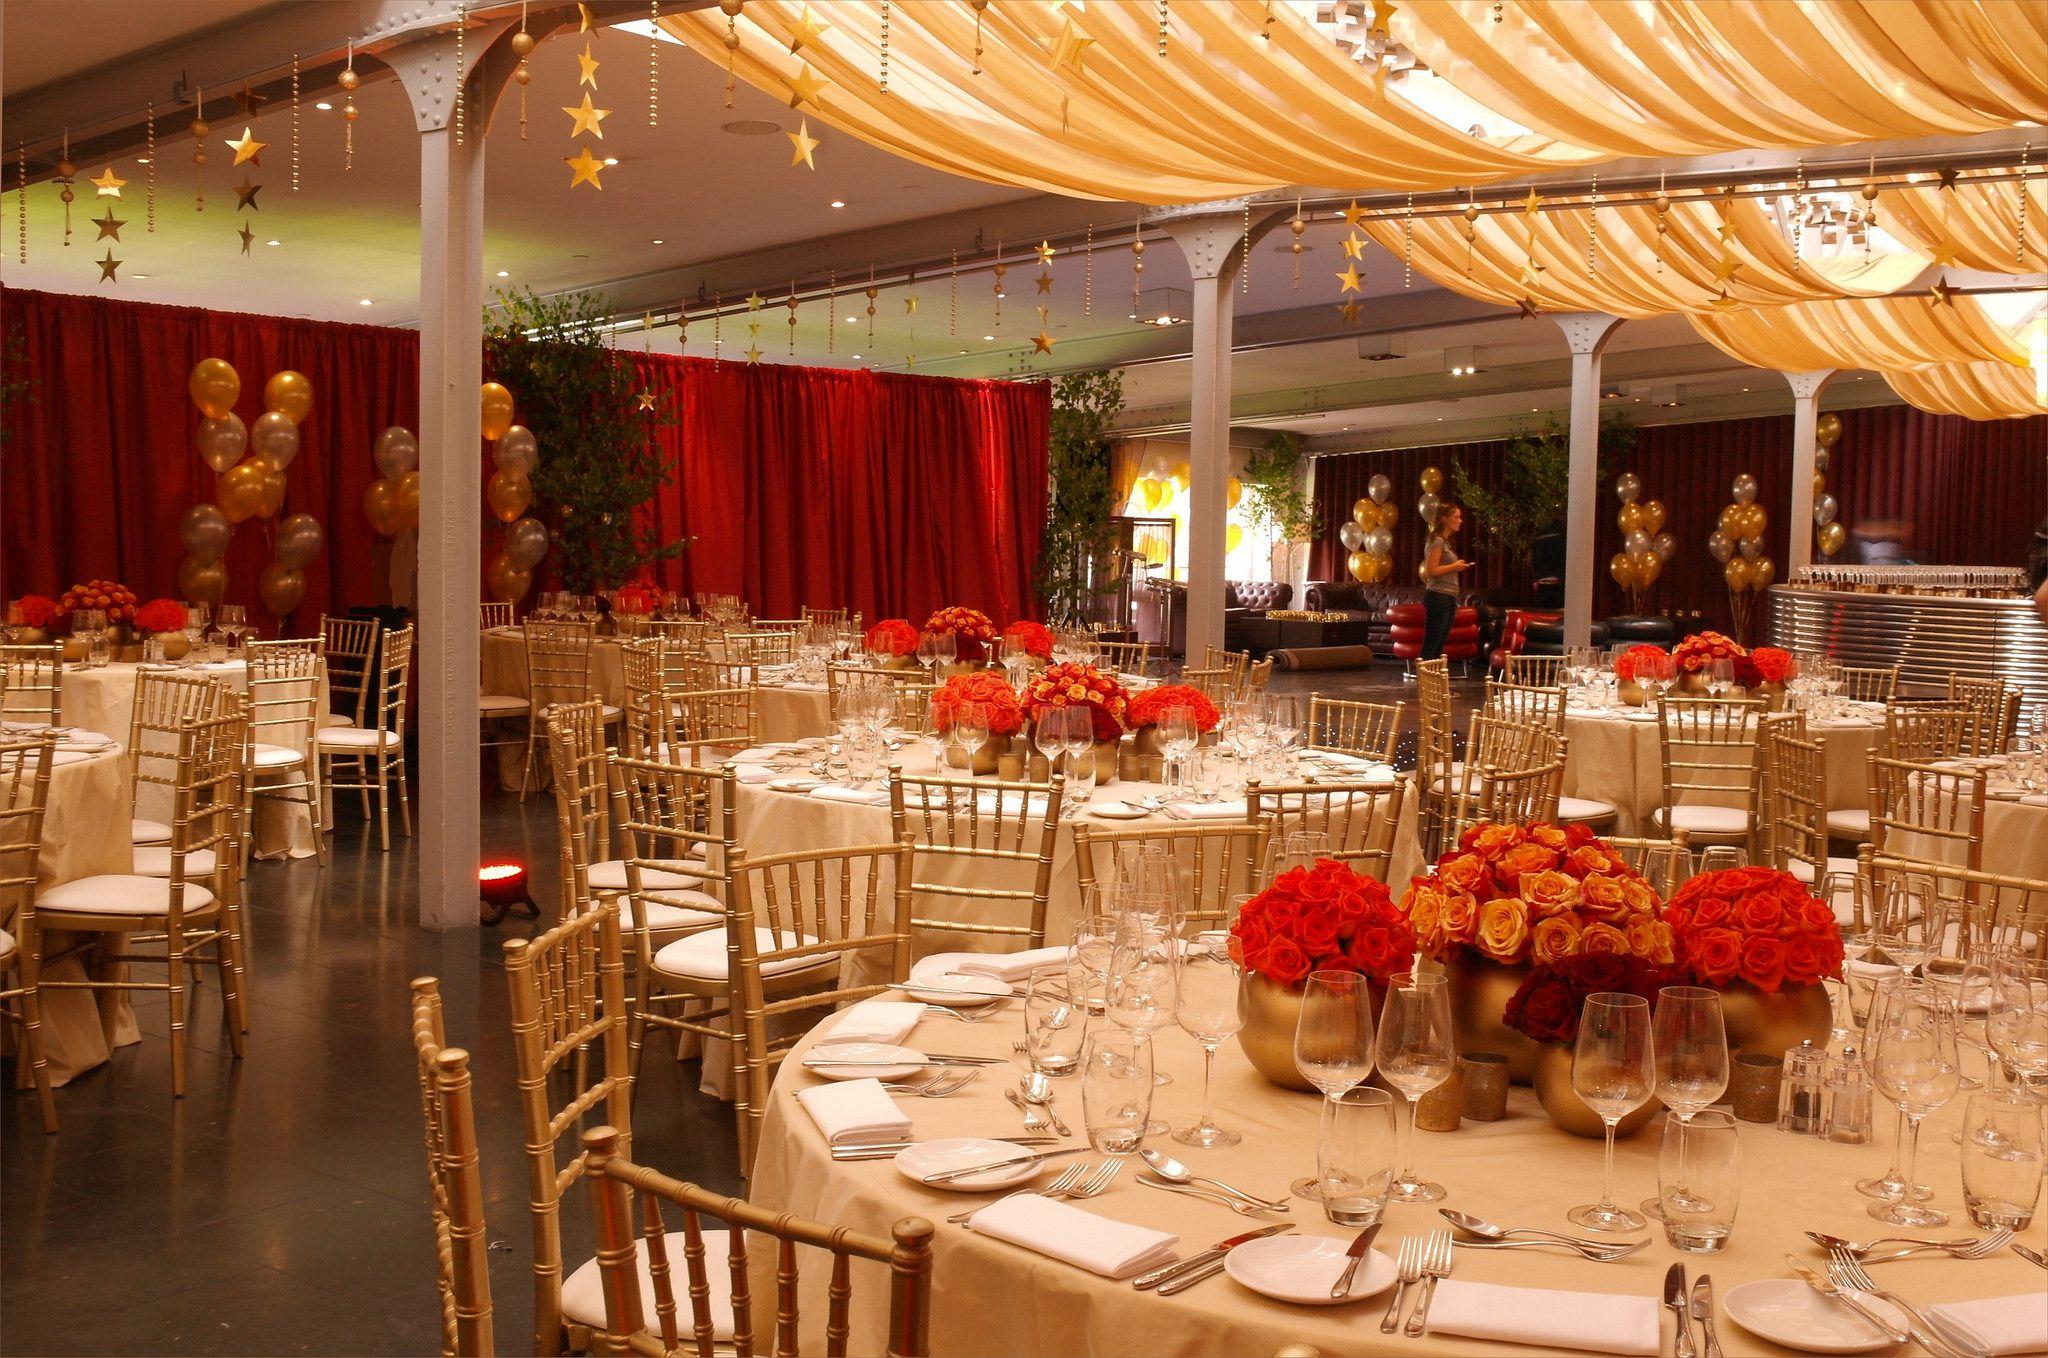 Bluebird Restaurant Chelsea - Black starlit dance floor, burgundy ...